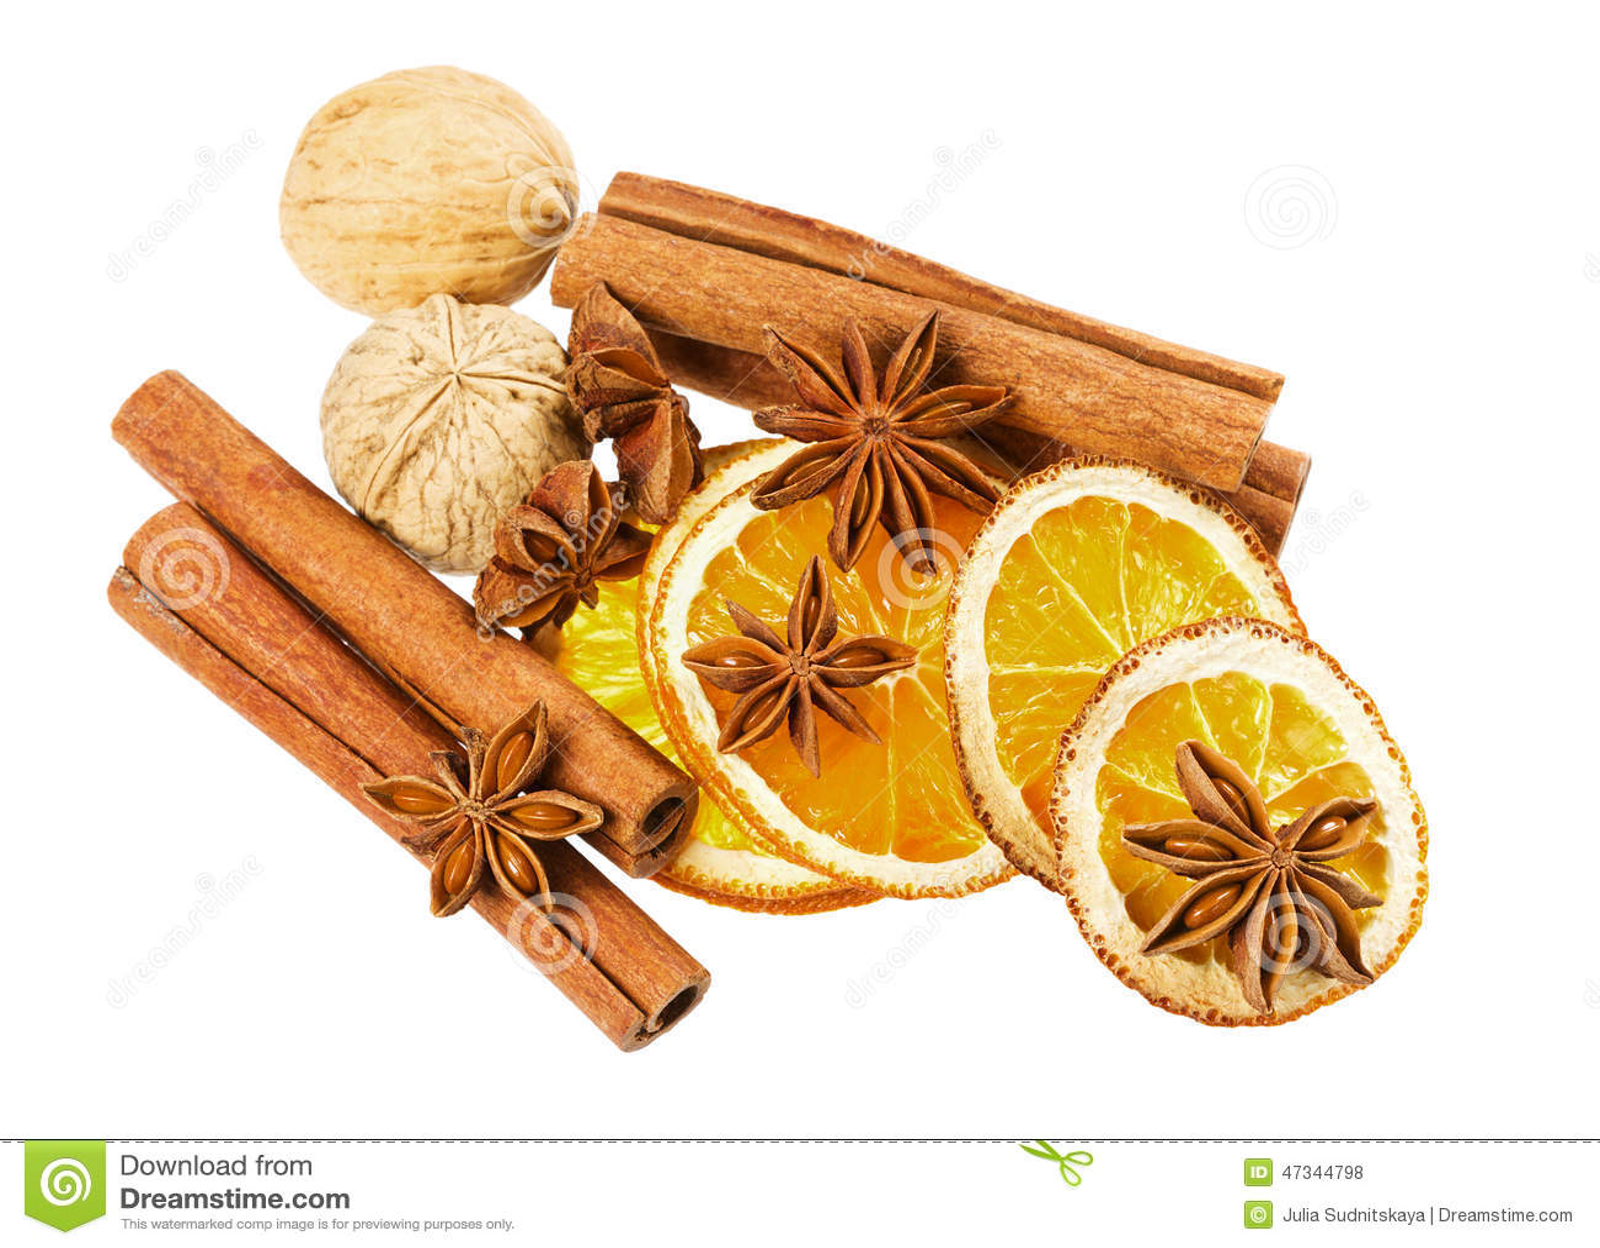 Anijsplantster, pijpjes kaneel, okkernoot en droge die sinaasappel op witte achtergrond wordt geïsoleerd